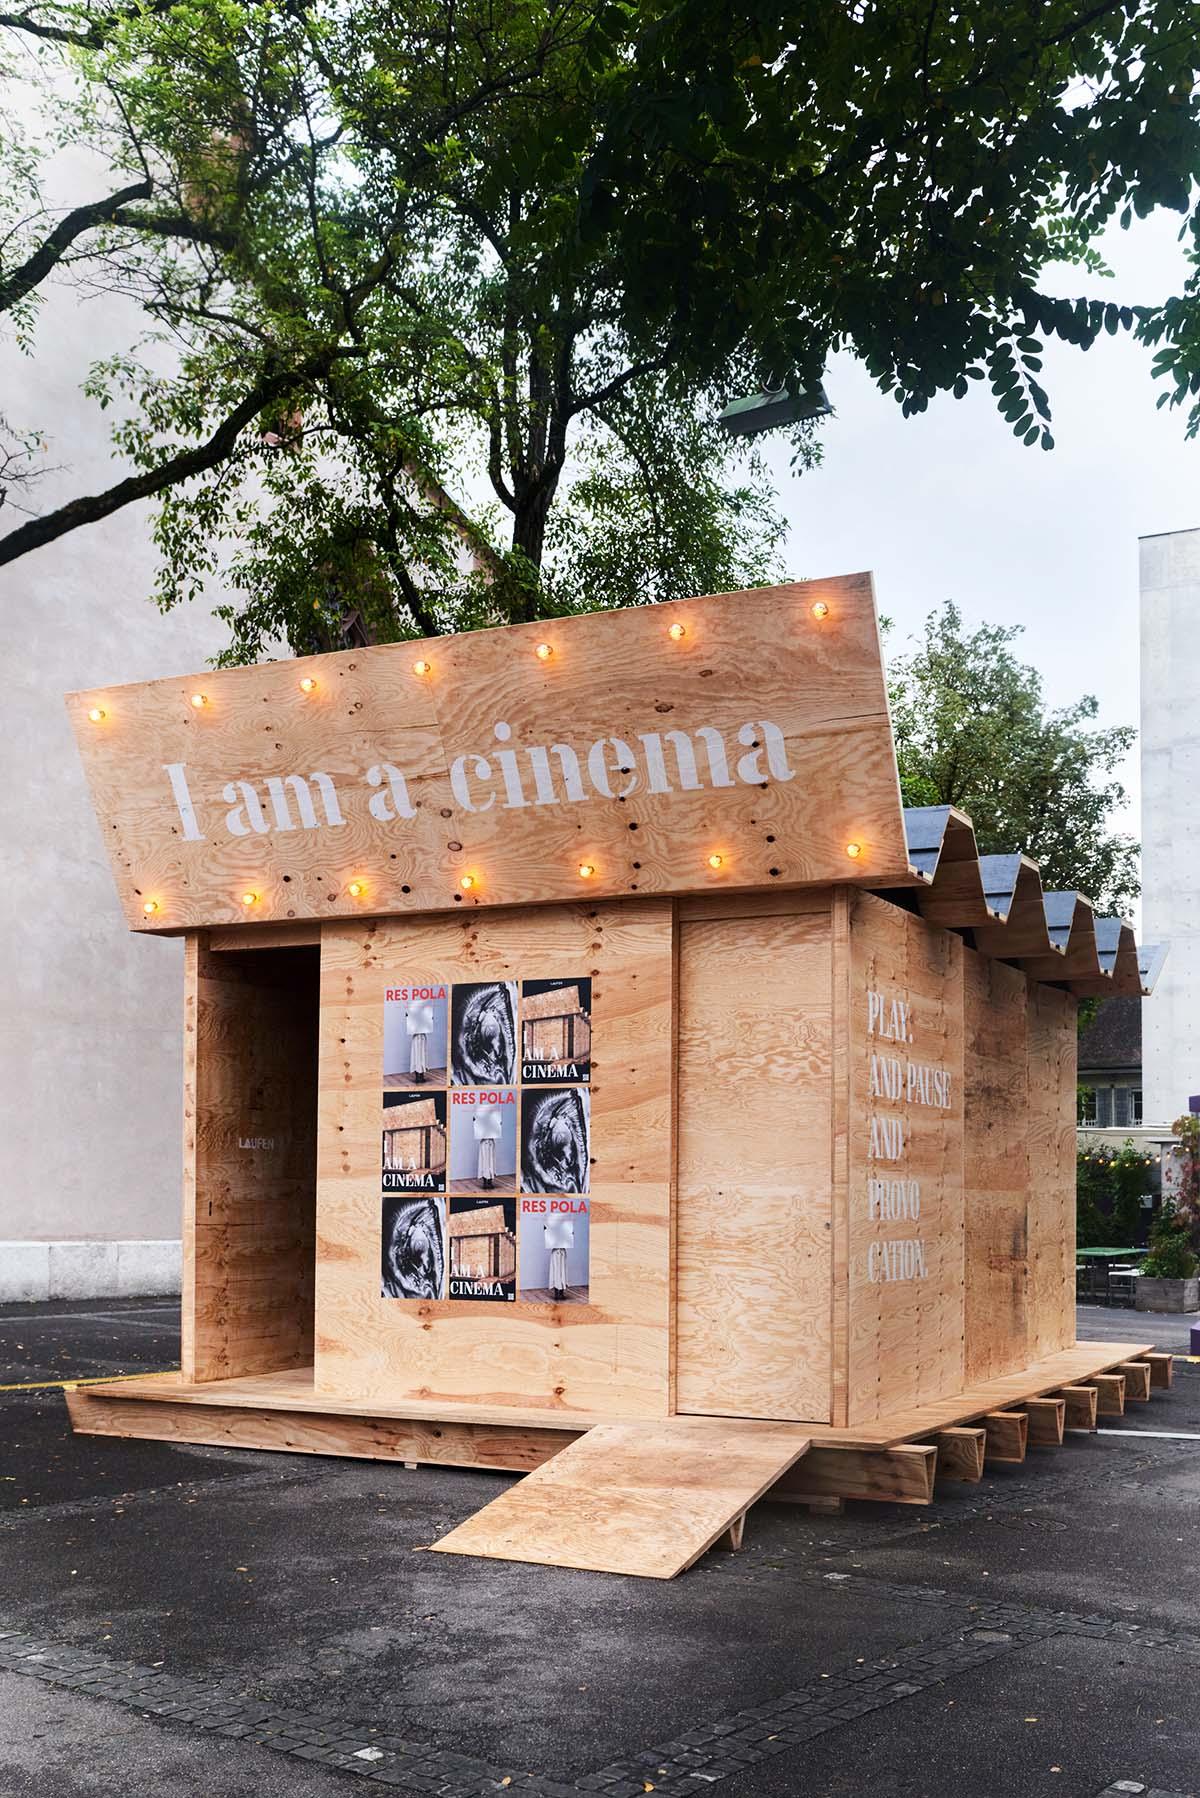 I am a cinema Filmbox